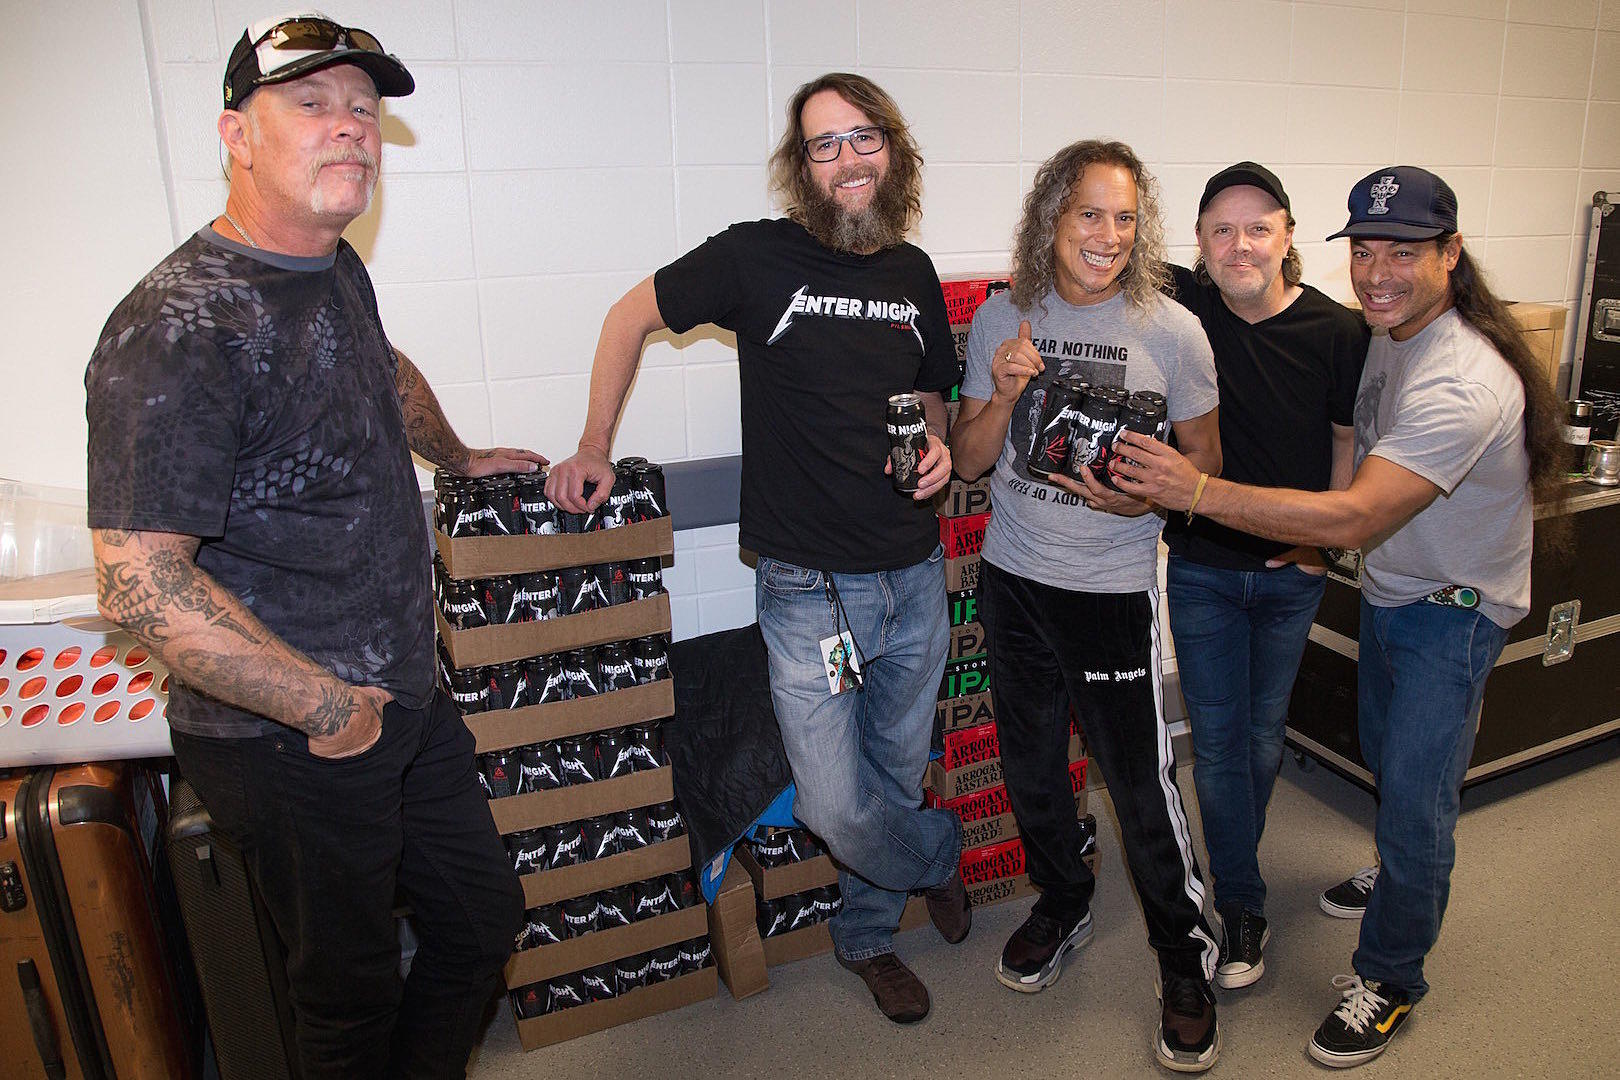 34f2f3dc44f0ed Metallica Reveal New  Enter Night  Pilsner Beer